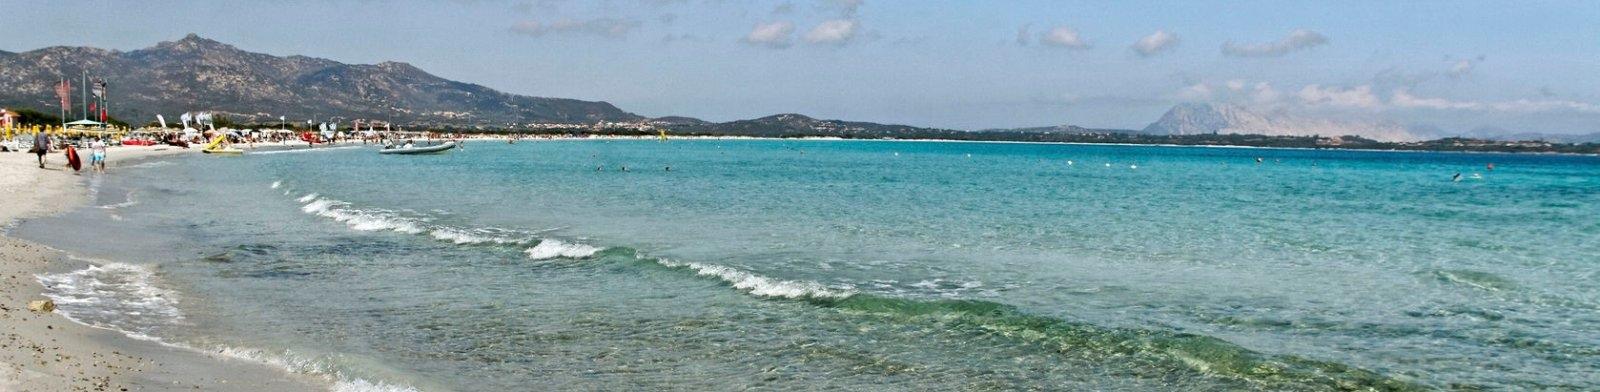 Golfo Aranci beach holidays